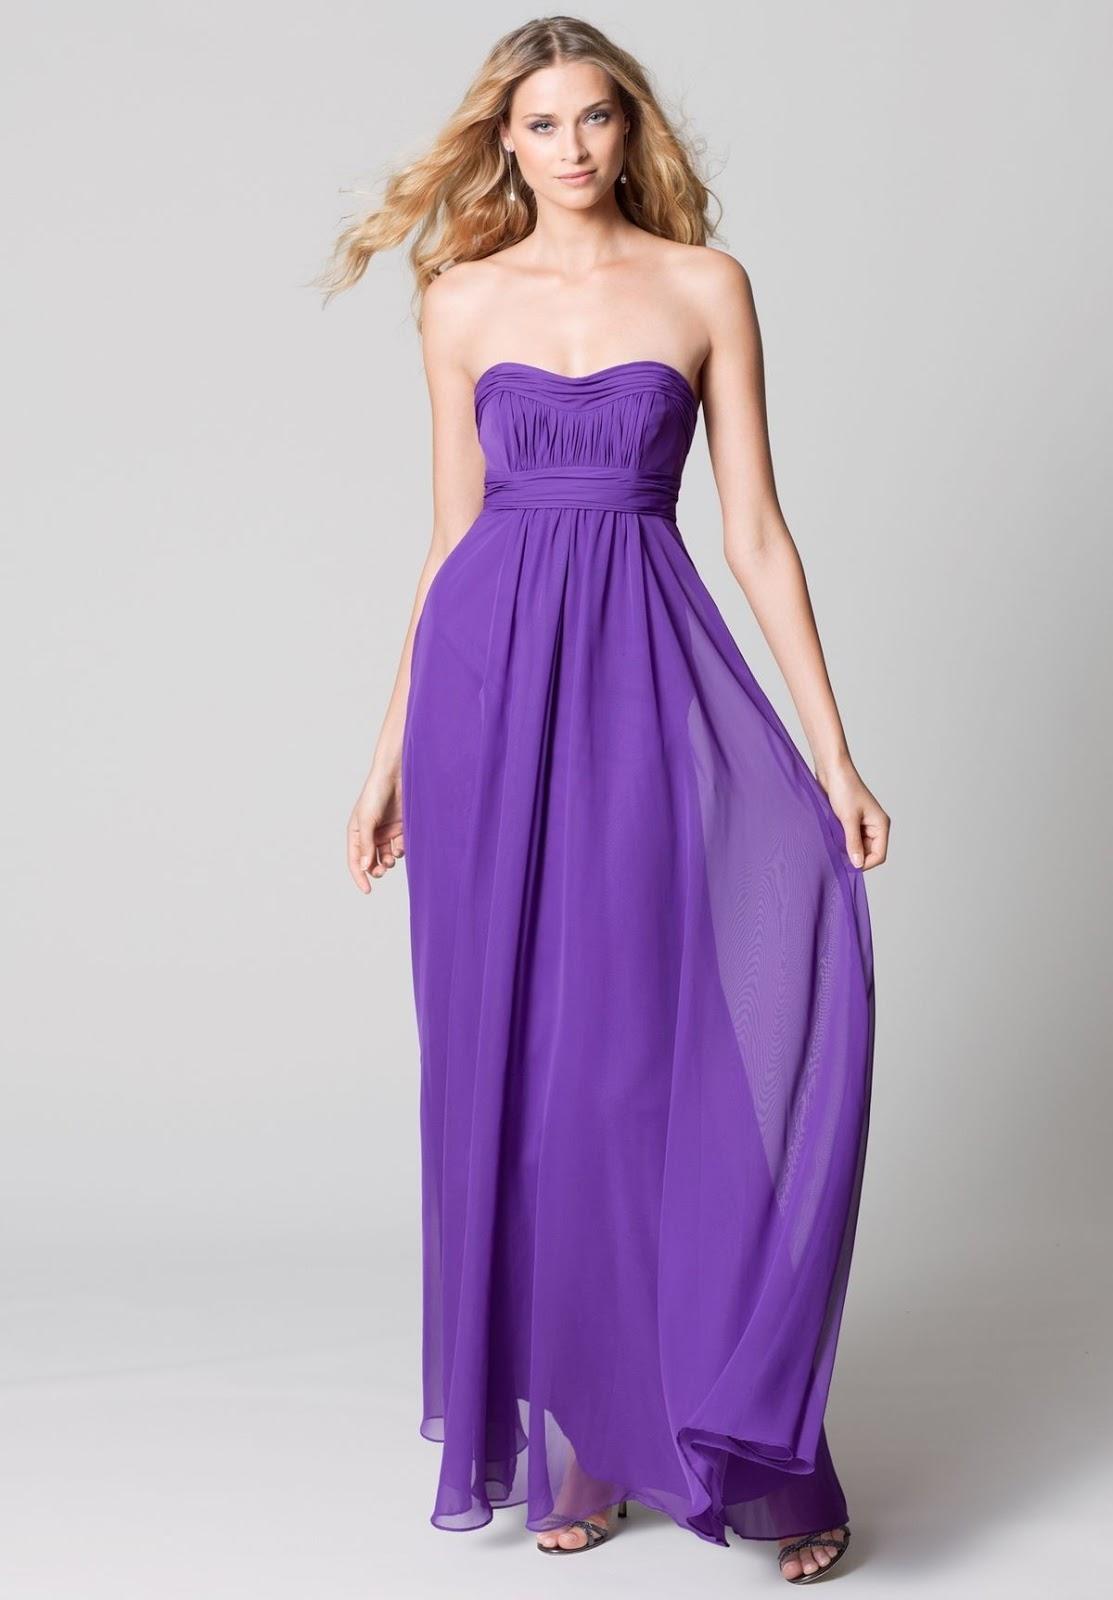 WhiteAzalea Bridesmaid Dresses: July 2013